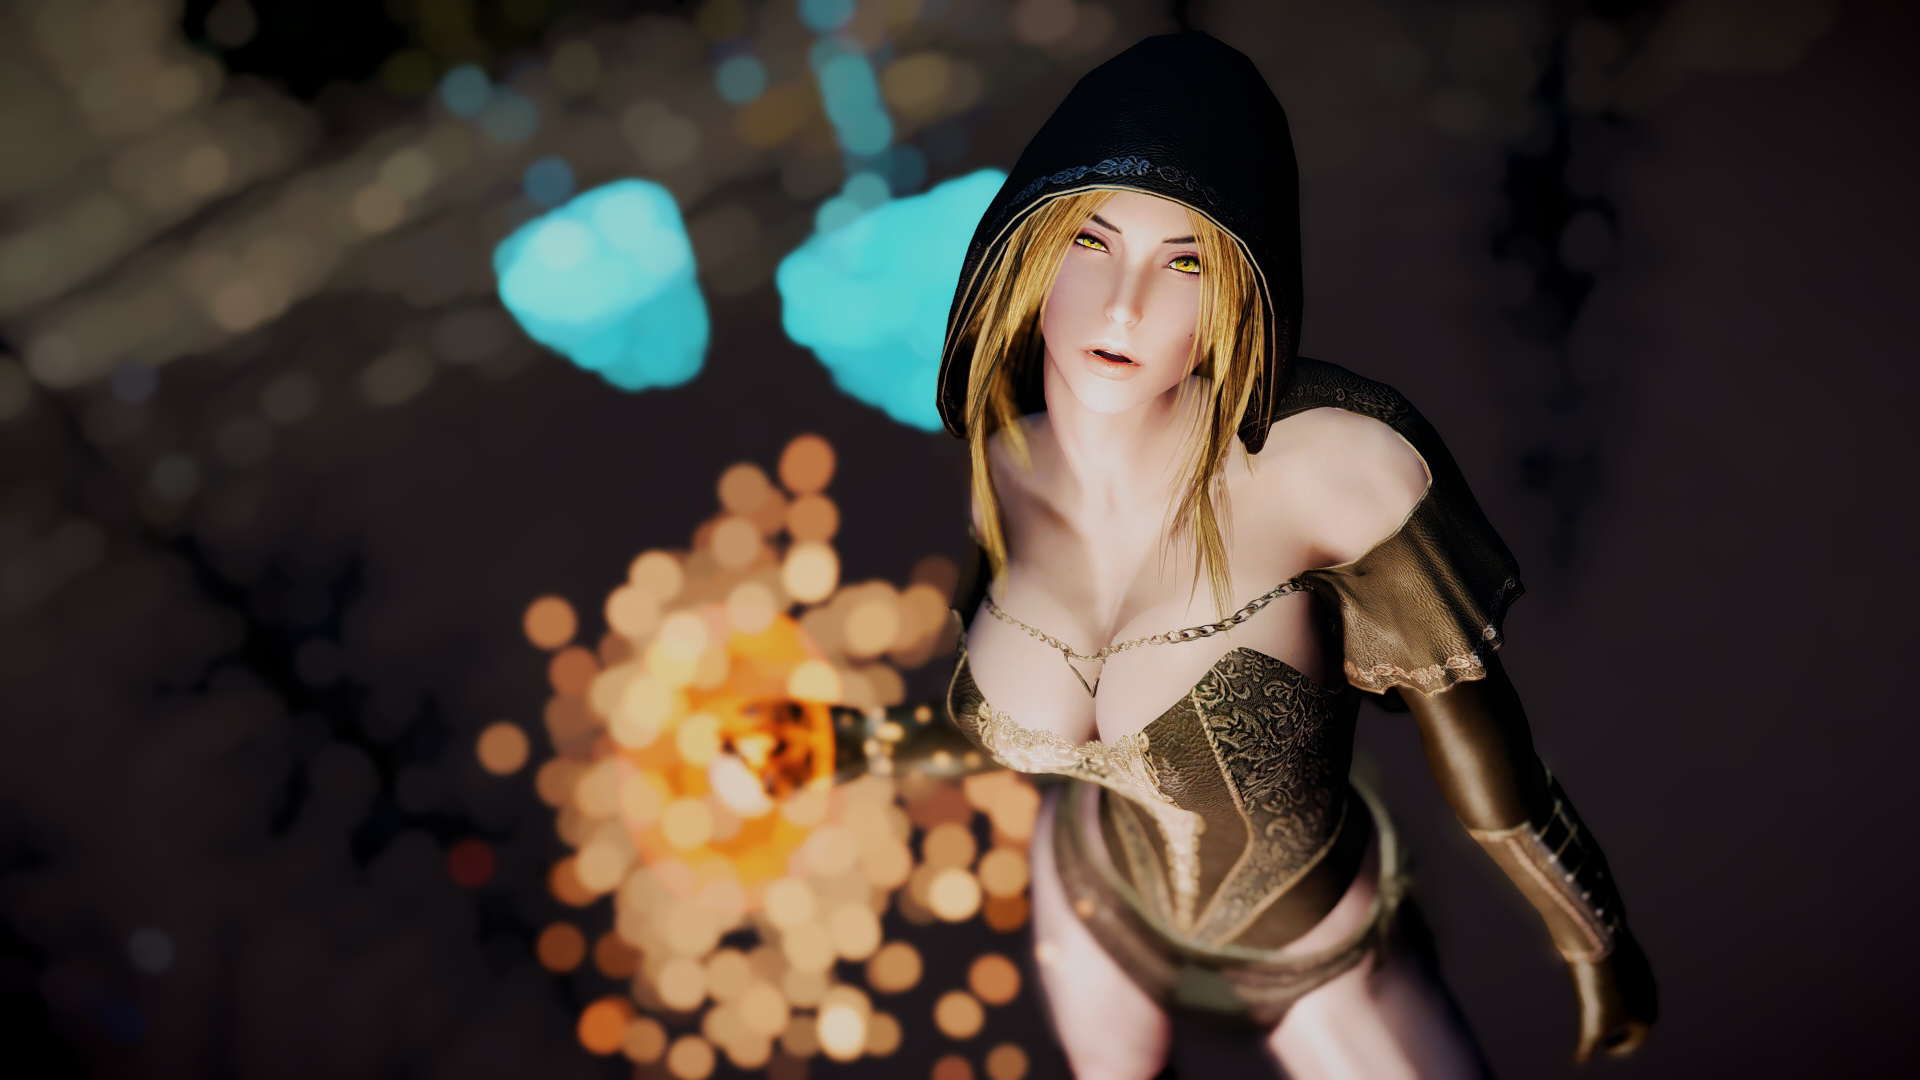 The_Elder_Scrolls_V__Skyrim_Special_Edition_Screenshot_2019_11.03_-_01_28_23_84.png